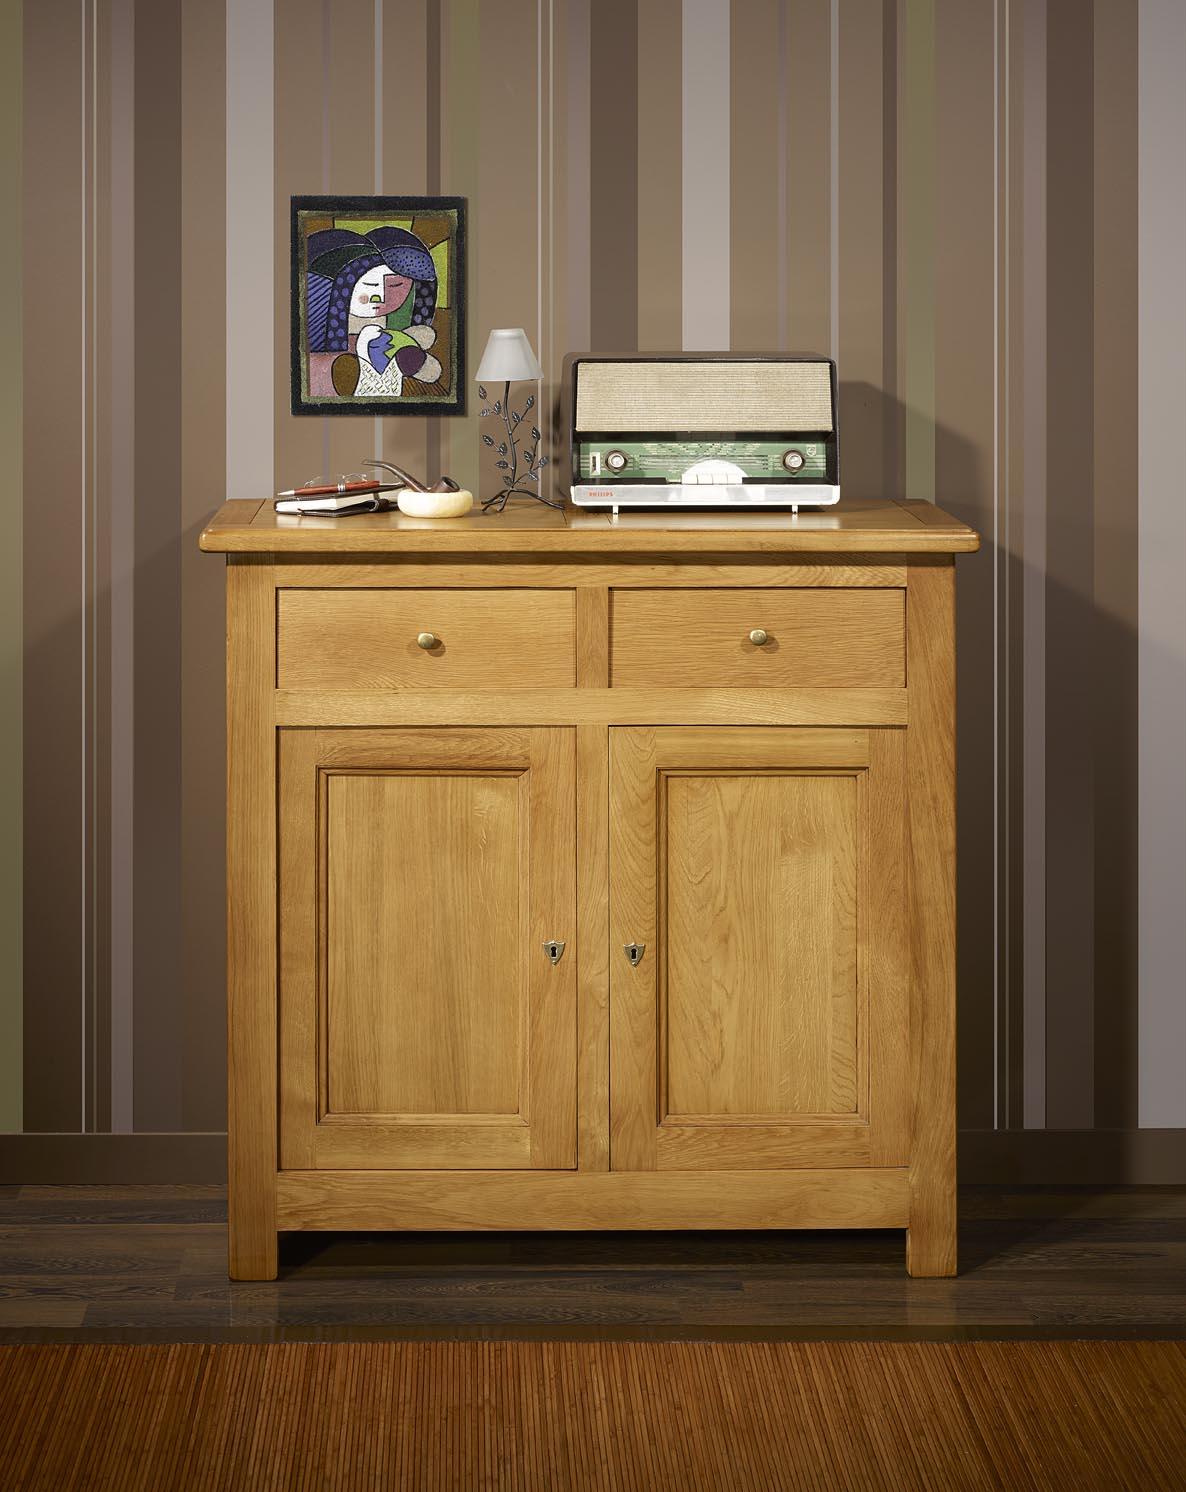 petit buffet 2 portes 2 tiroirs en chene massif de style campagnard meuble en chene massif